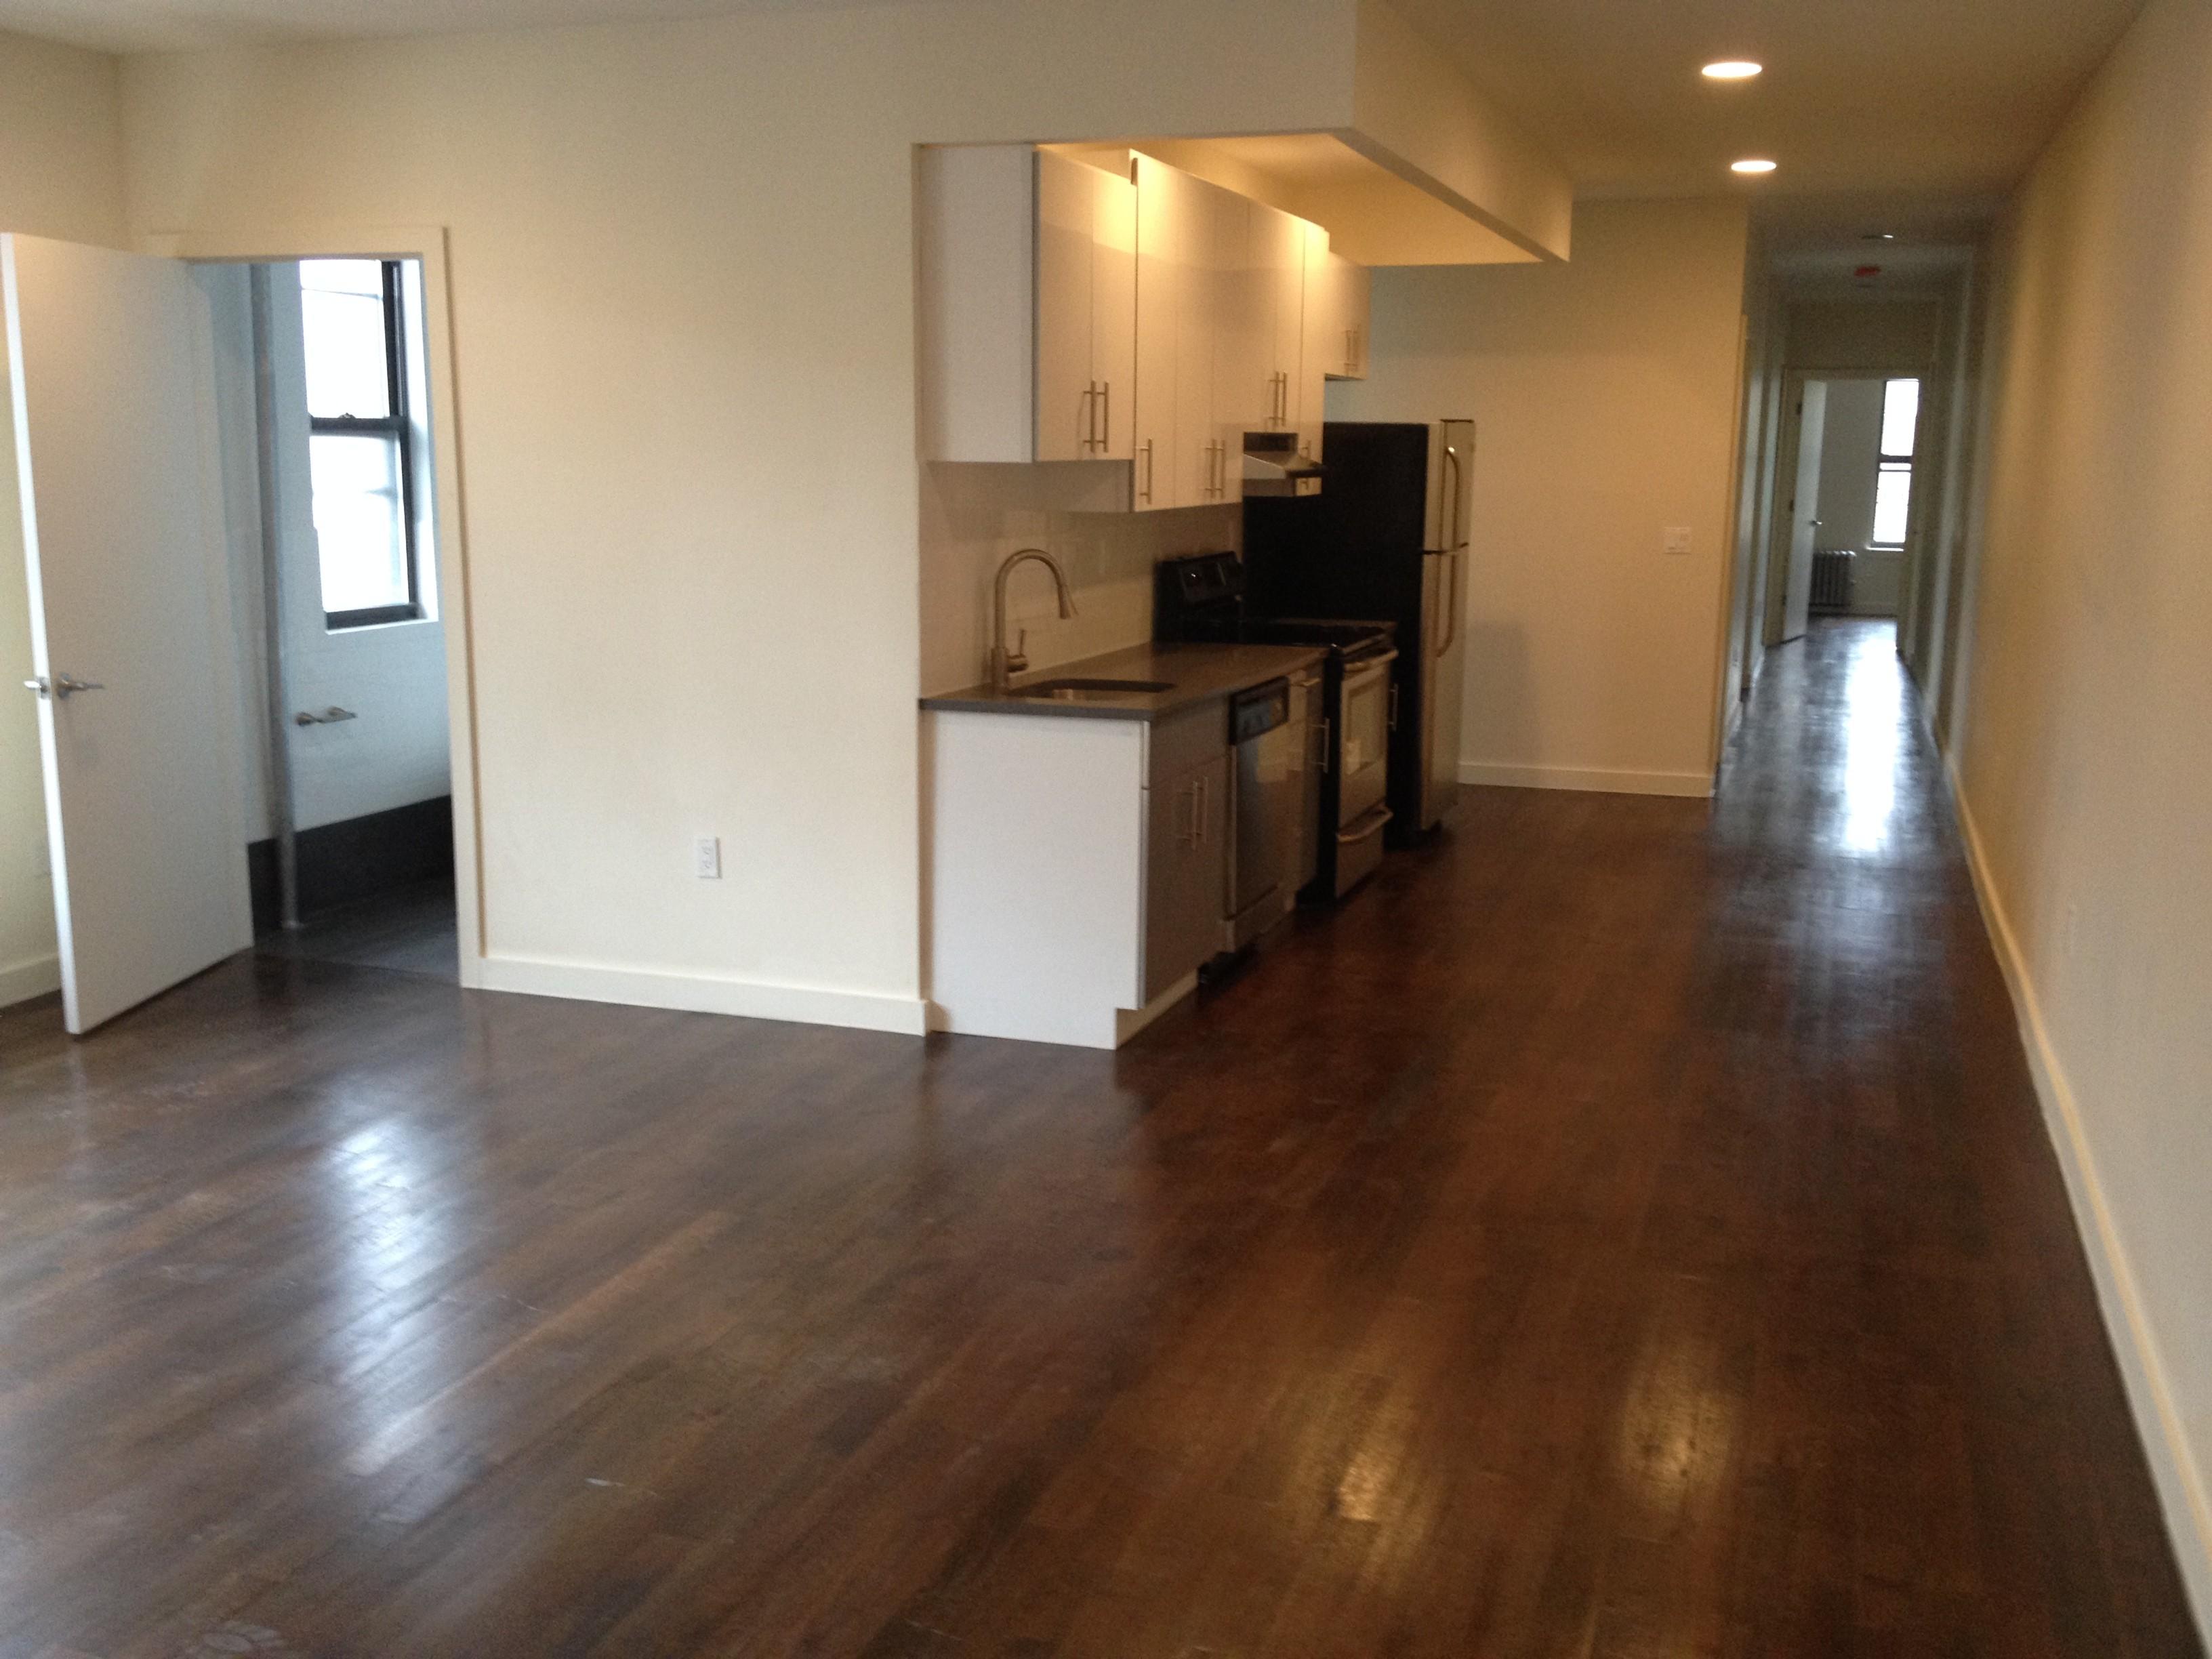 broadway w 151st st 8 new york ny 10031 5 bedroom